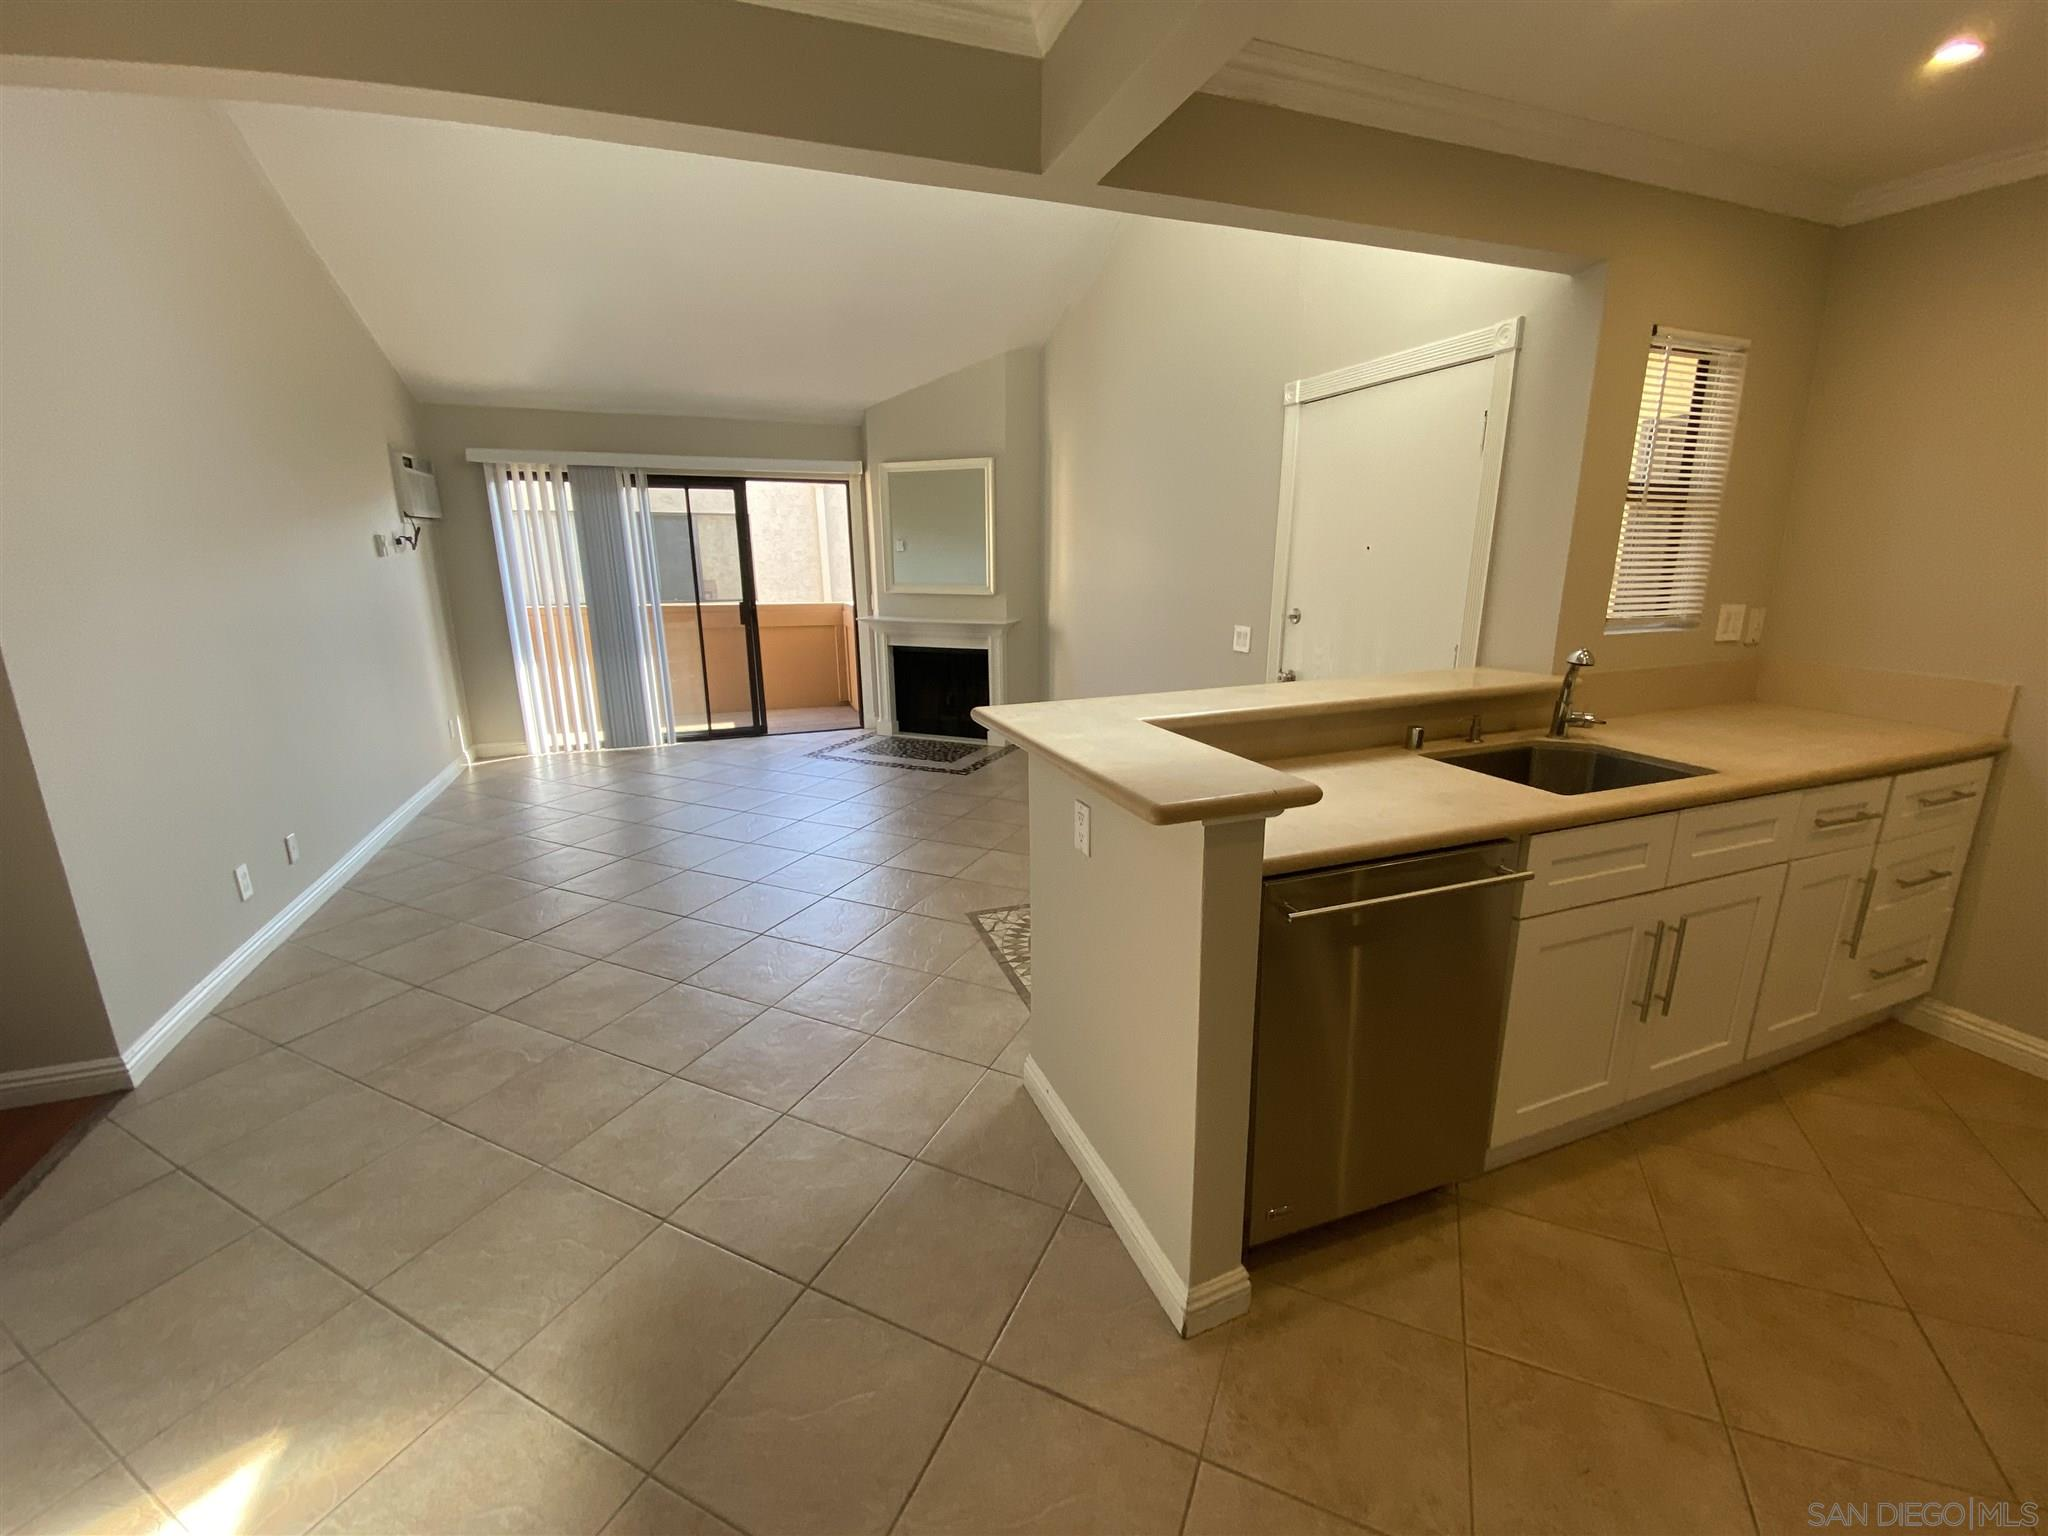 2920 Briarwood Rd G11, Bonita, CA 91902